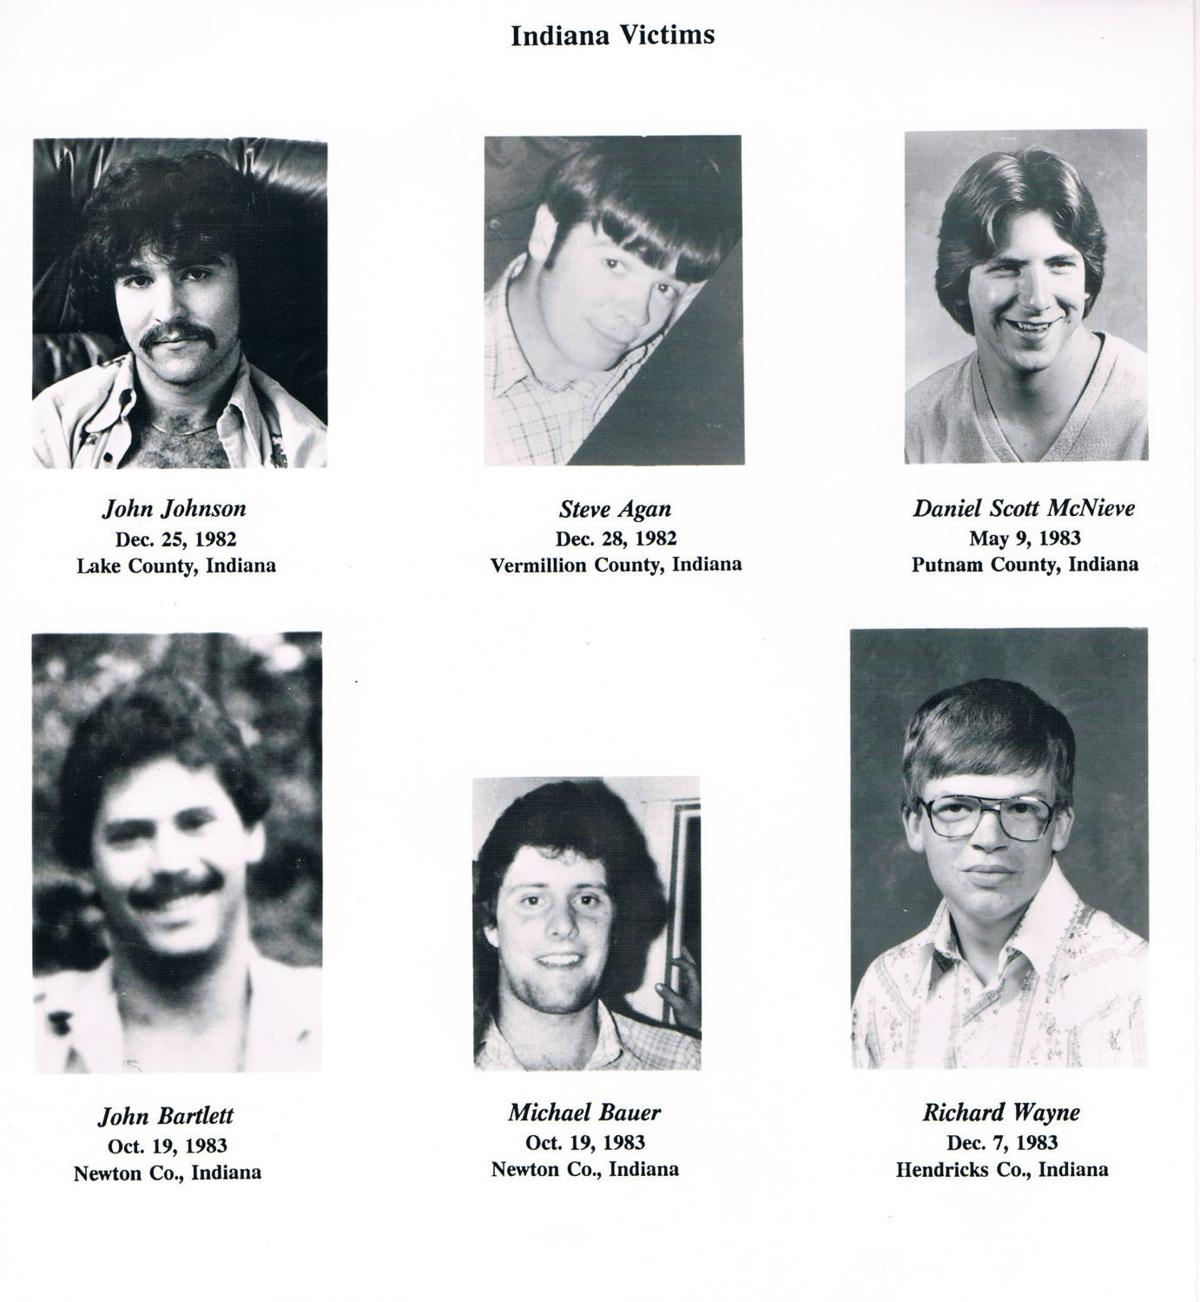 Indiana victims